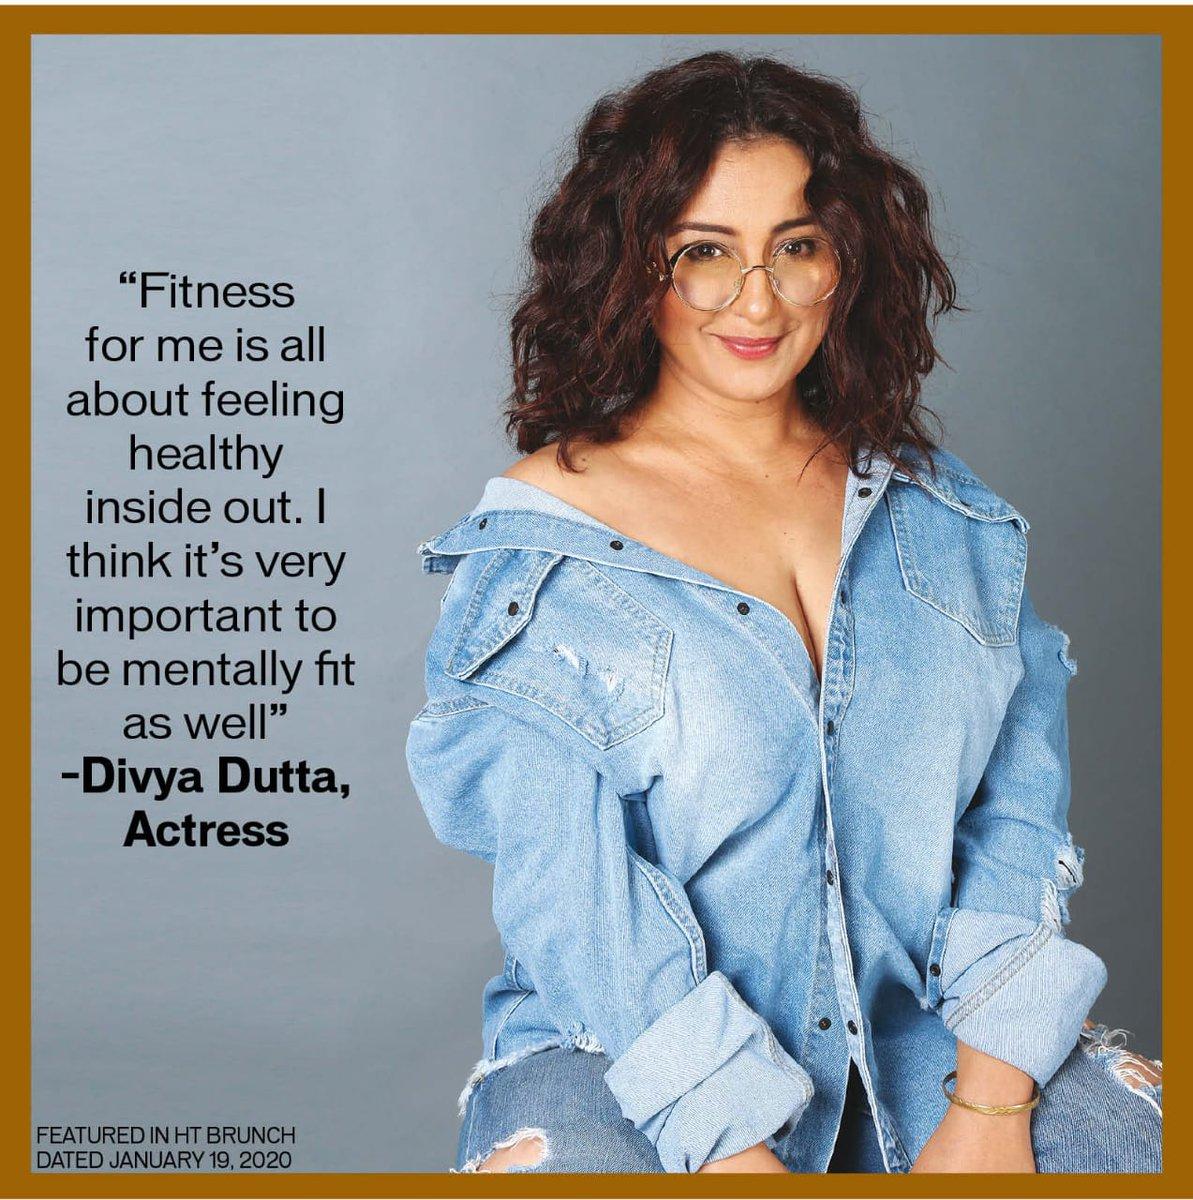 National-Award winning actress Divya Dutta gives her take fitness #personalagenda #bollywood #actors #bollywoodactresses #actresseswelove #nationalaward #nationalawardwinner #divyaduttapic.twitter.com/nmMh9RqpEs